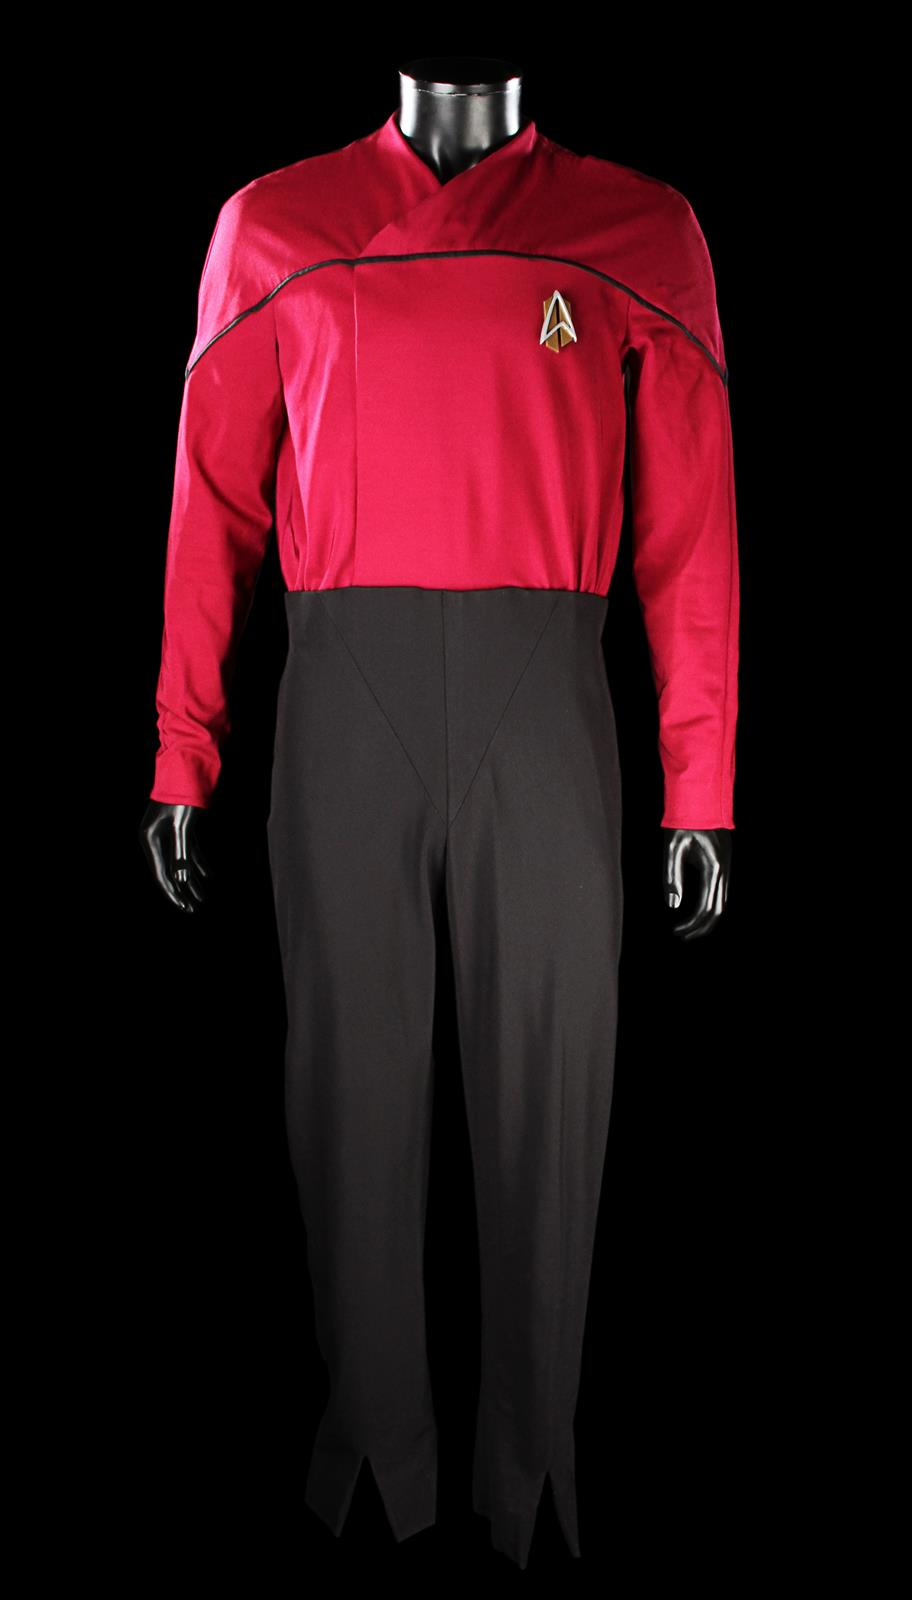 STAR TREK: VOYAGER (TV 1987-1994) - Future Starfleet ...